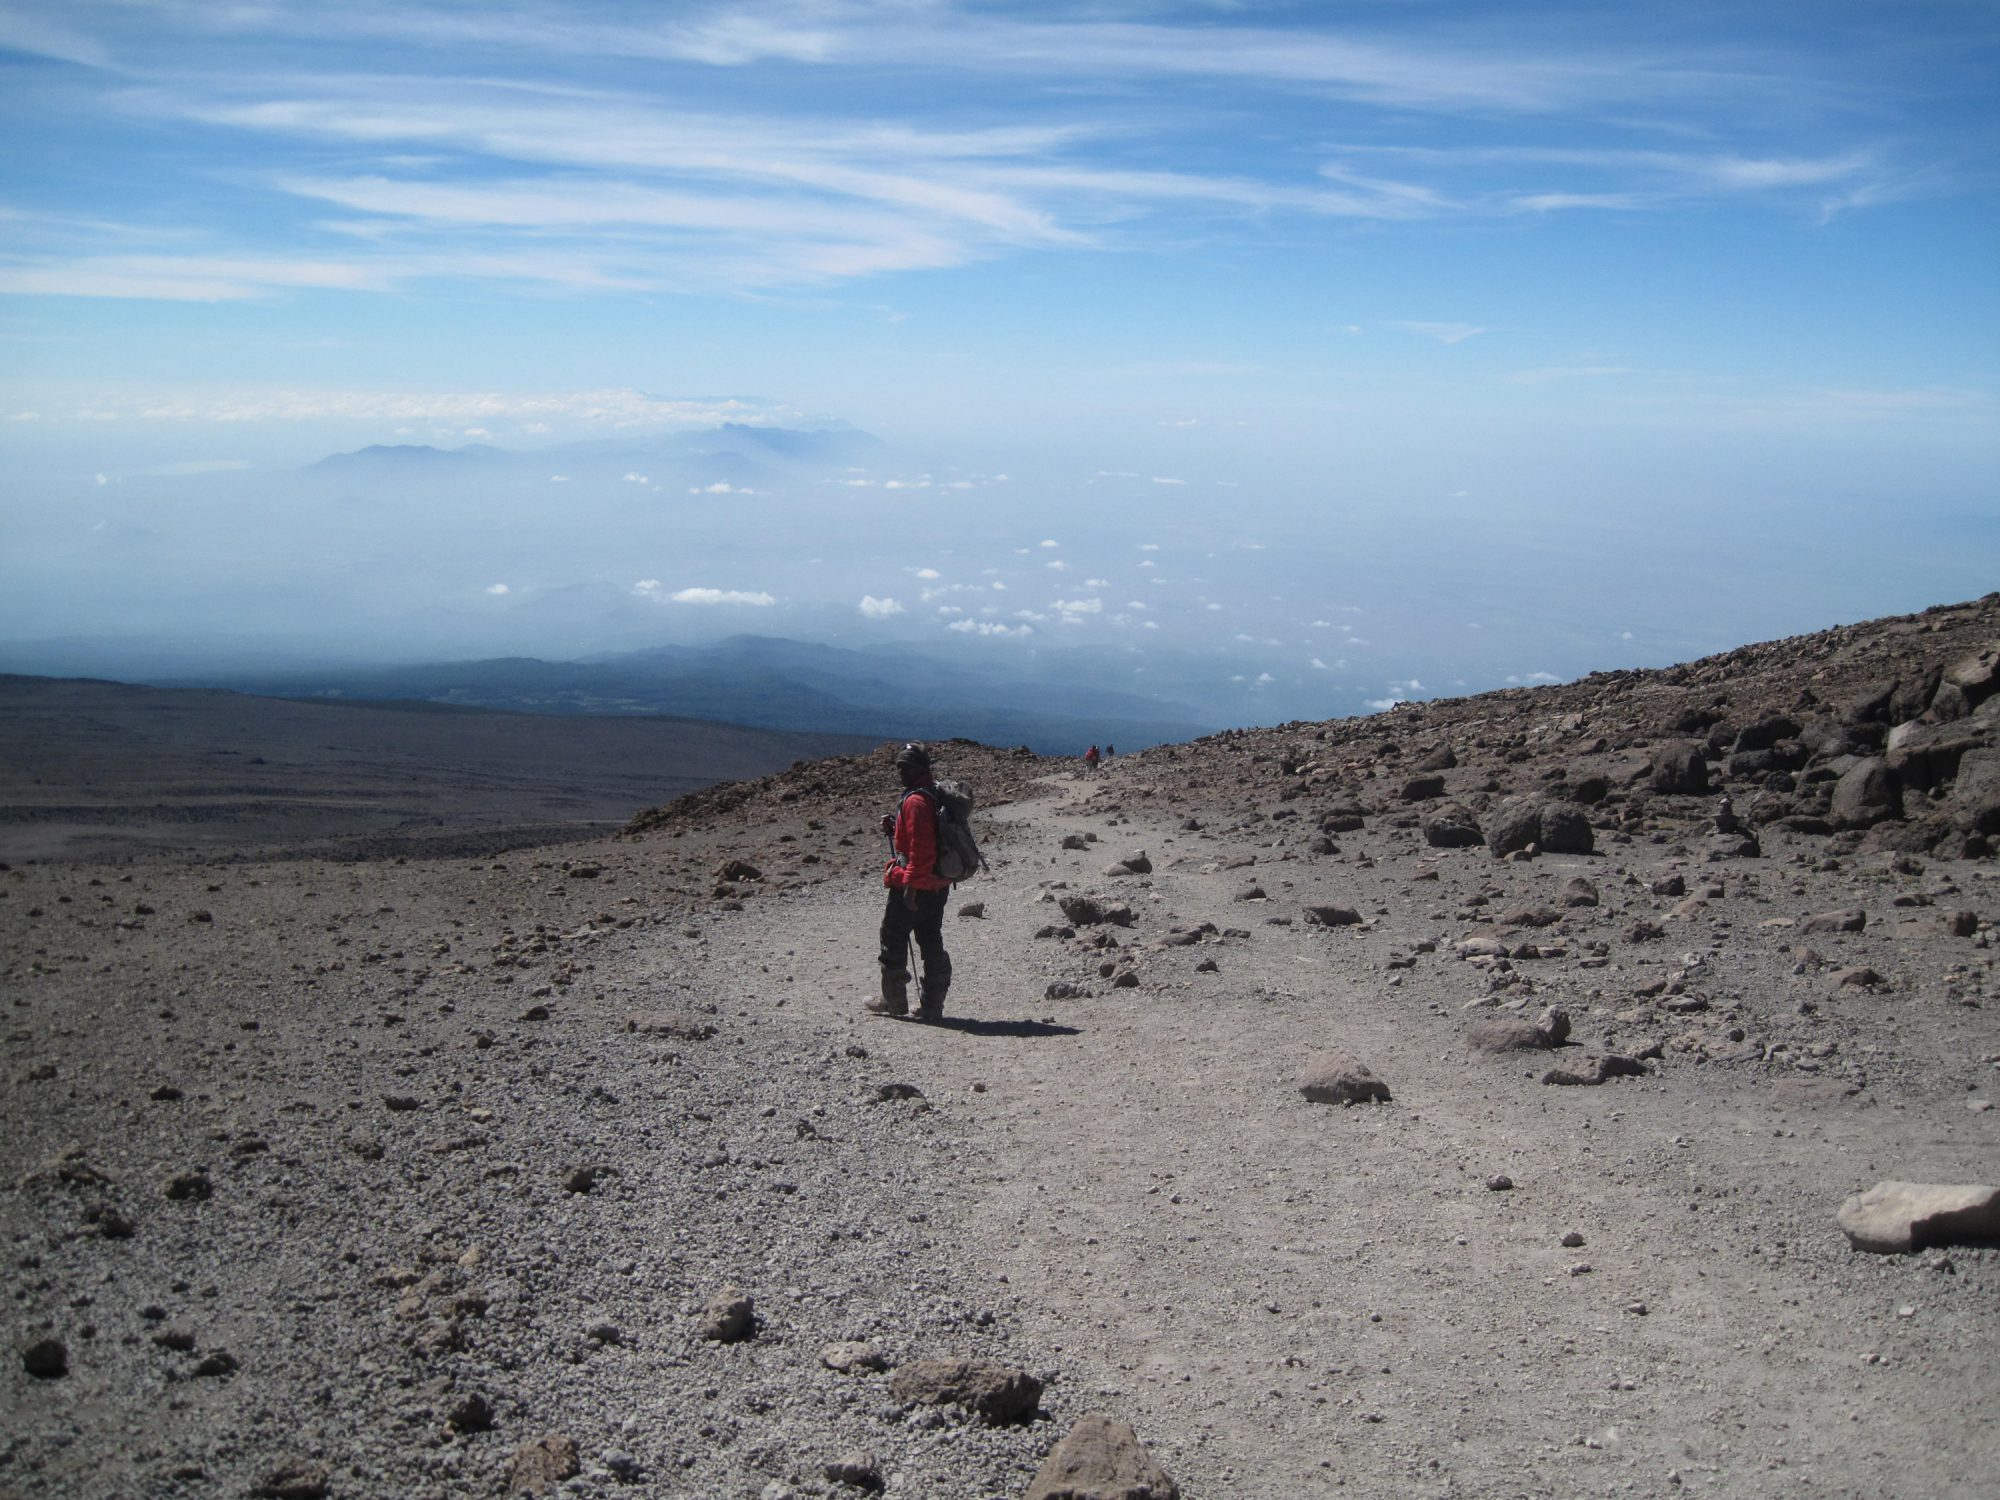 Wanderweg, Kilimandscharo, Kilimandscharo besteigen, Tansania, Afrika, Kilimandscharo Tour, Erfahrungsbericht, Machame Route